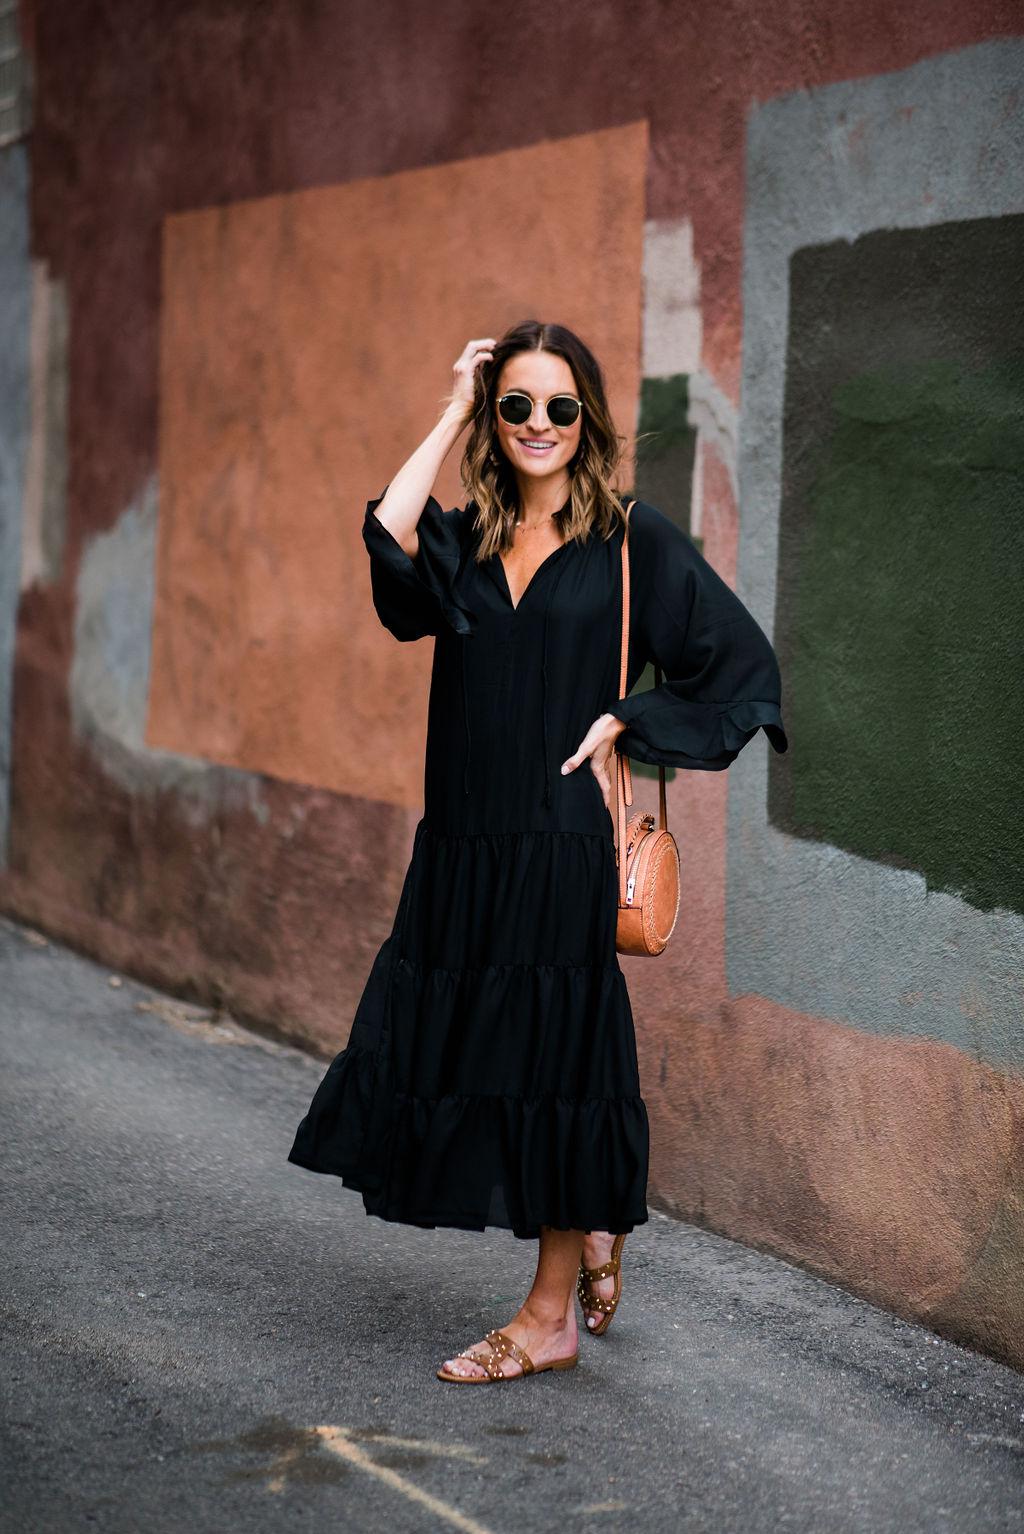 lauren sims budget-friendly fashion